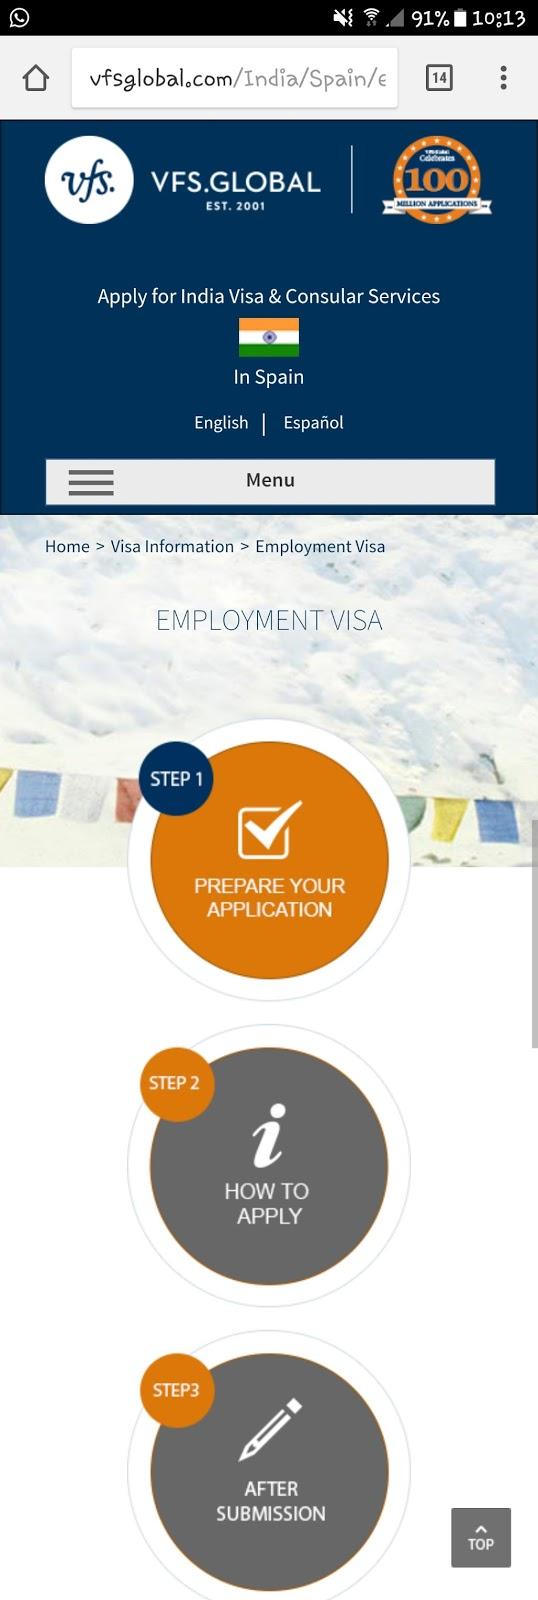 vfs global tourist visa application